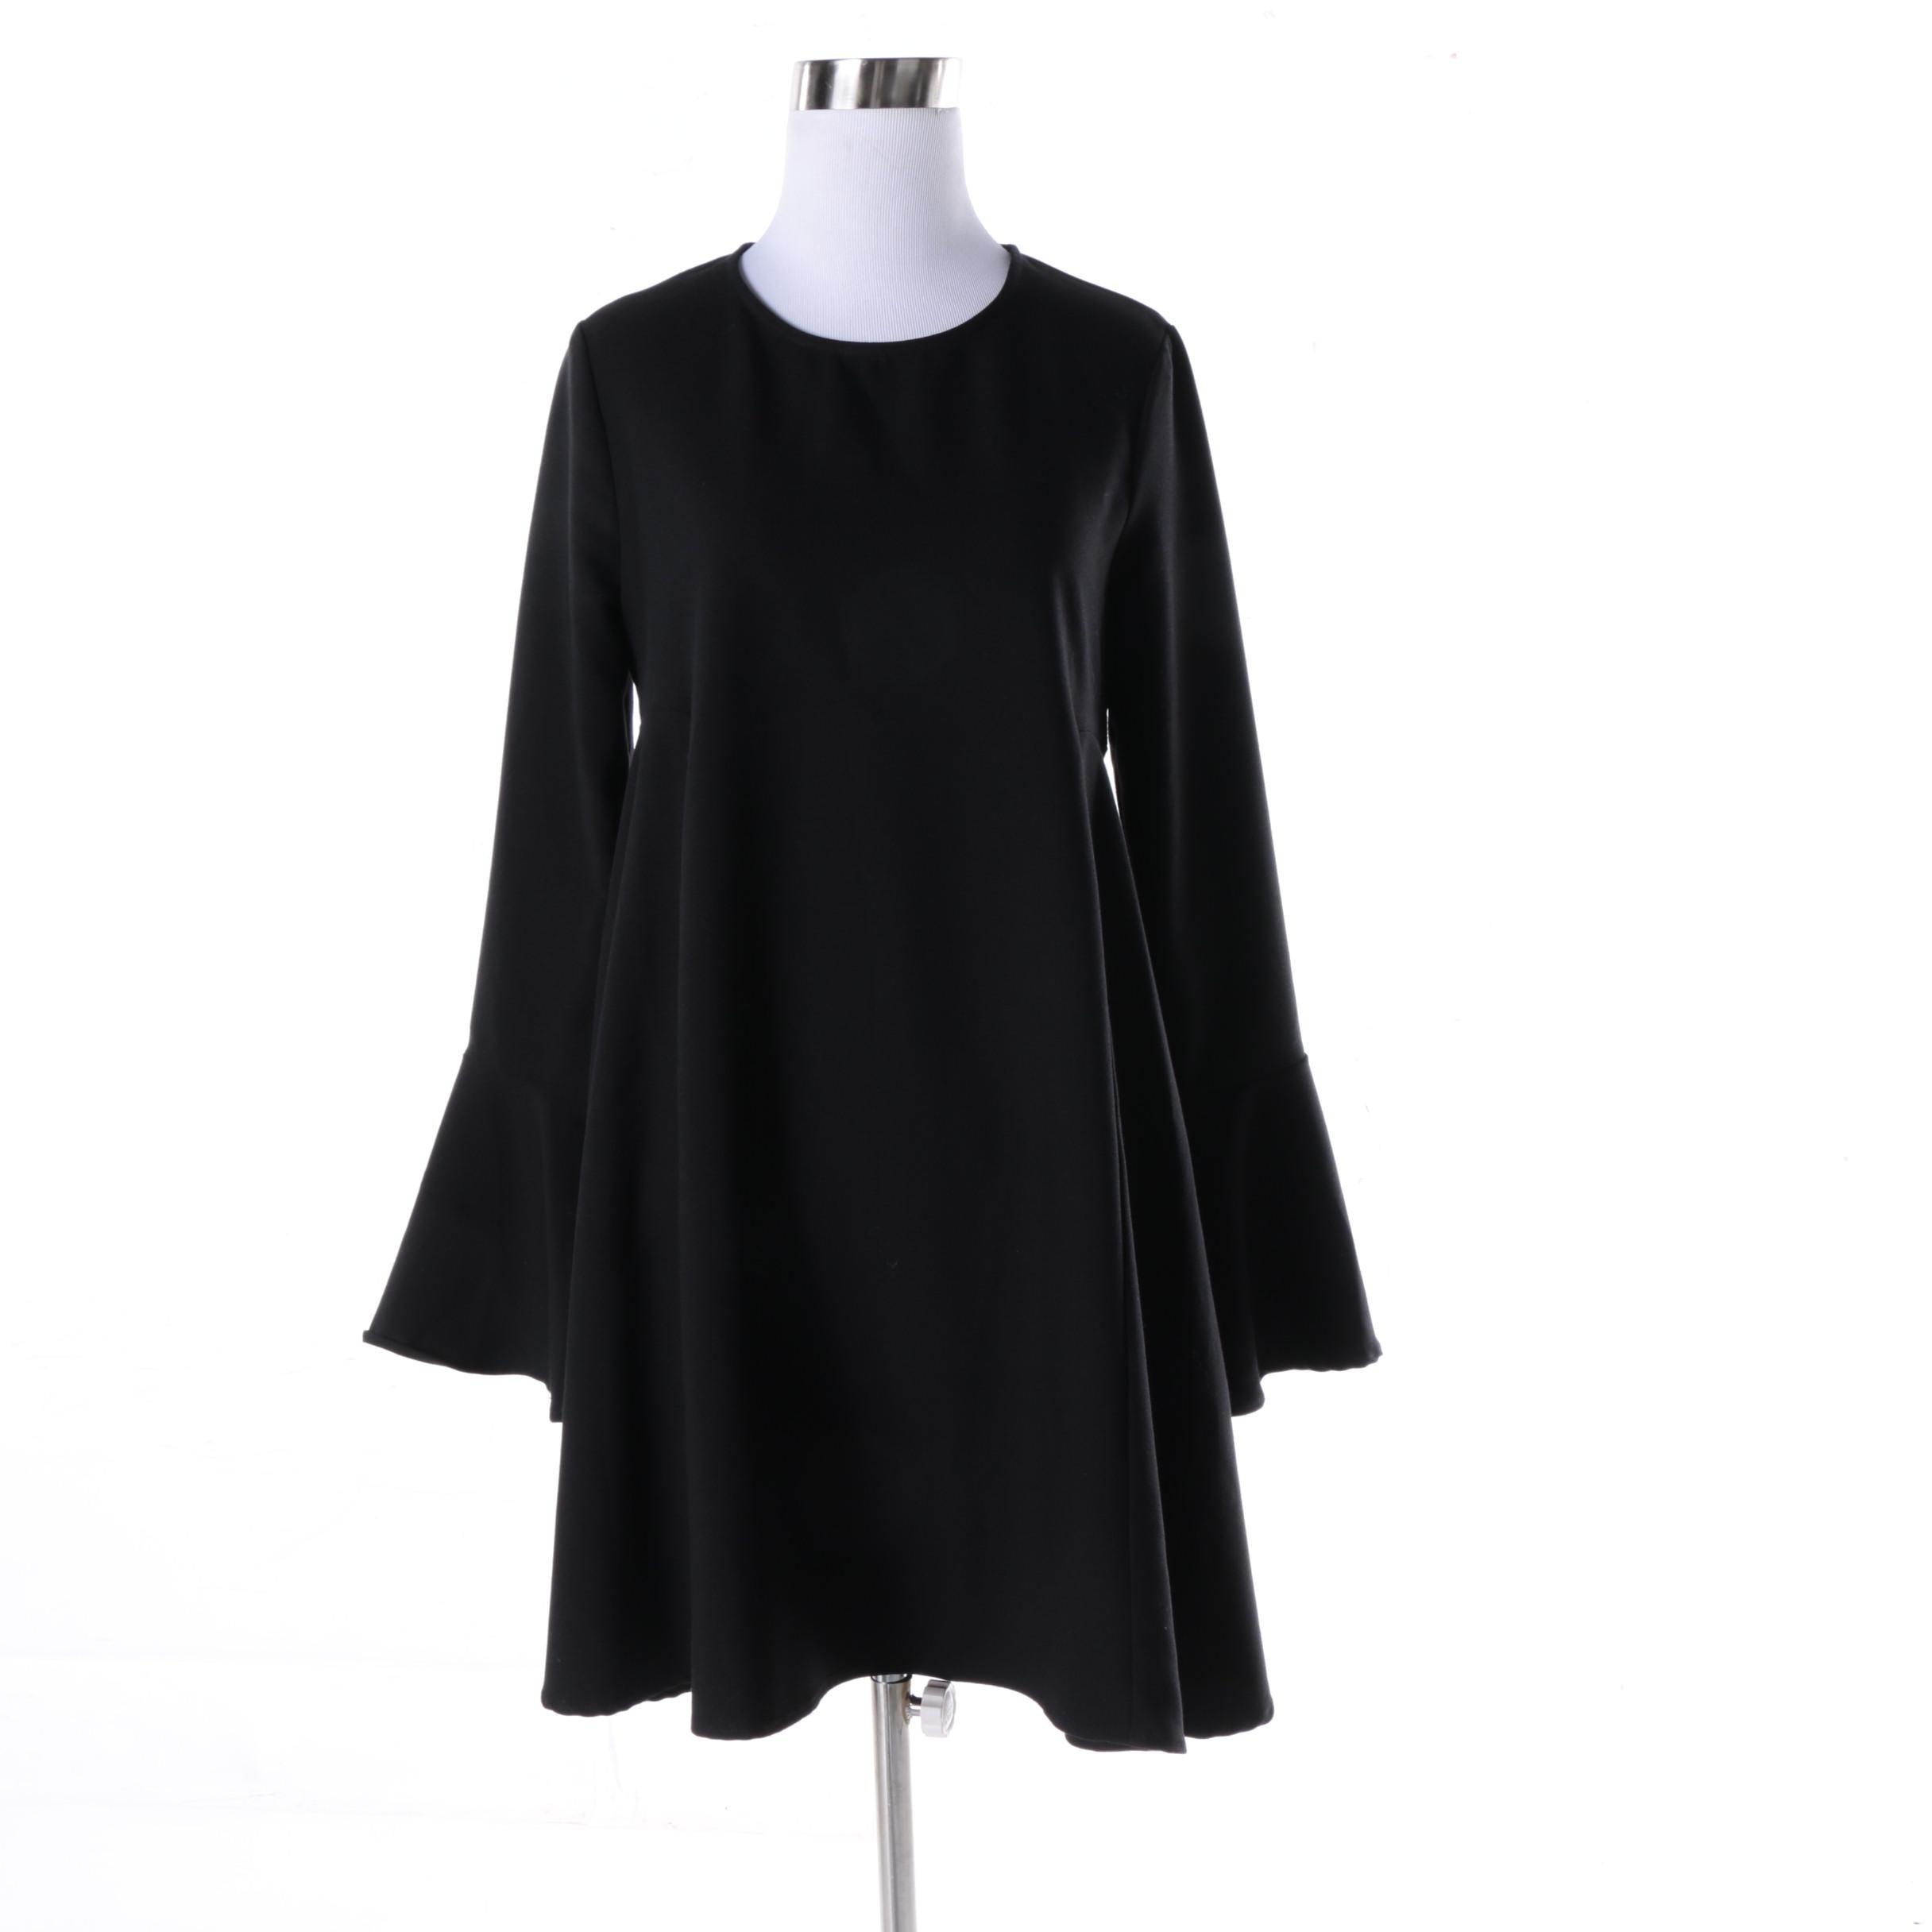 Women's WAYF Black Polyester Blouse